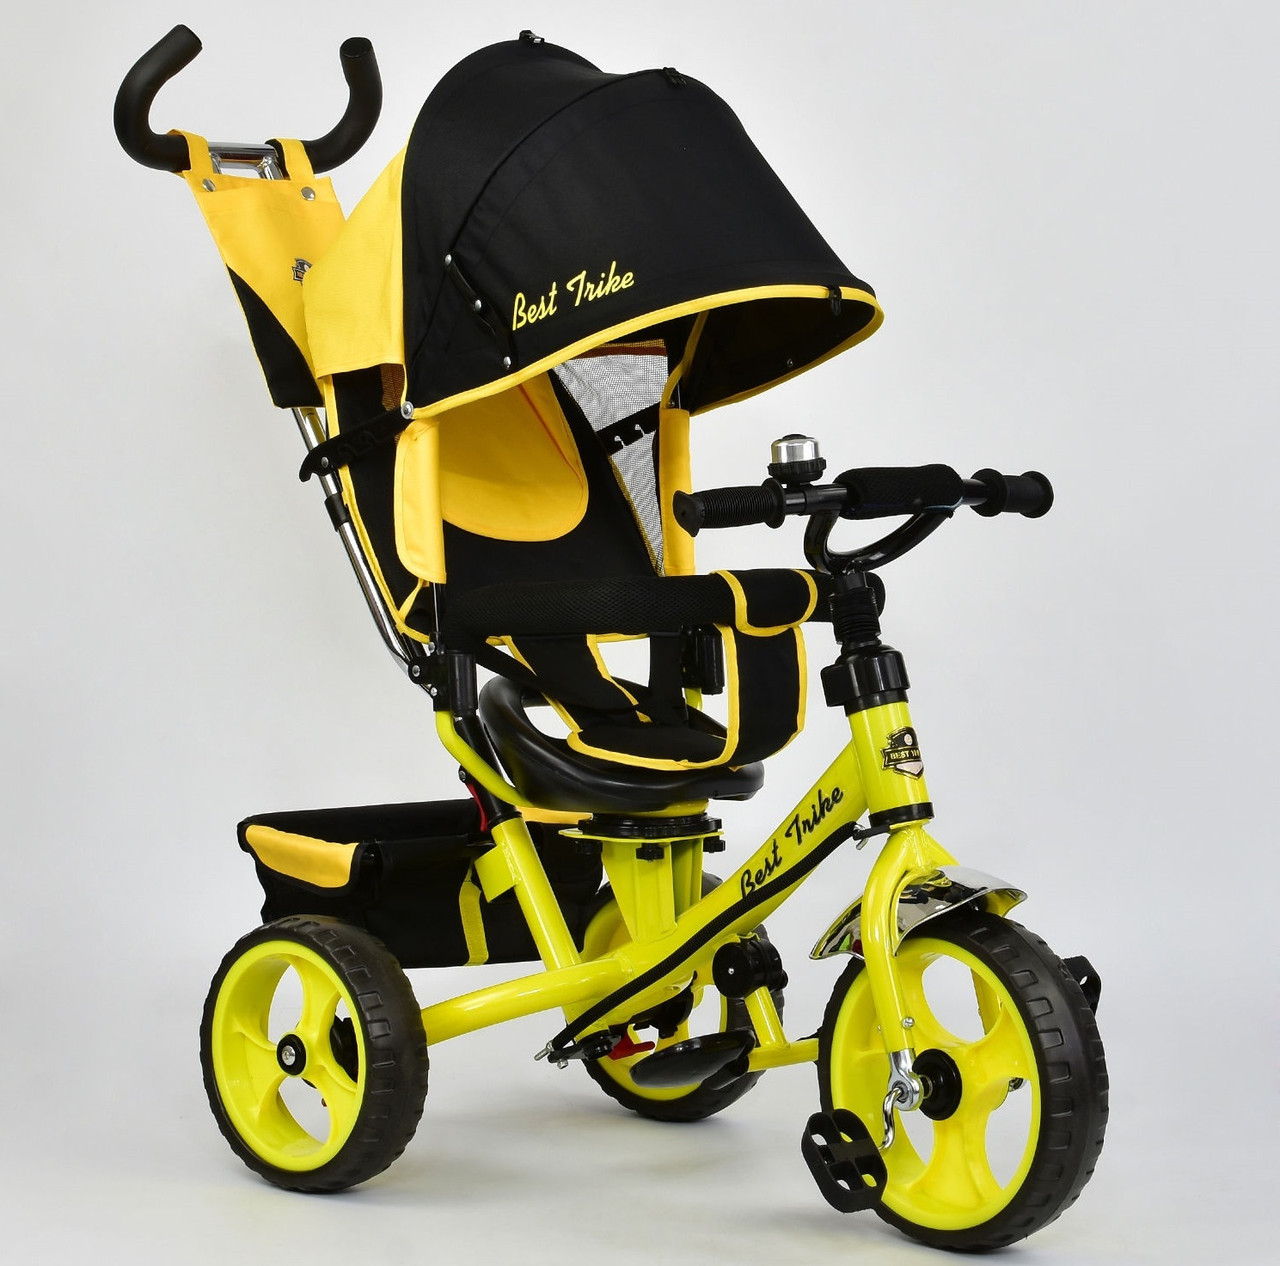 Best Trike Велосипед Best Trike 5700 4890 Black Yellow (5700)